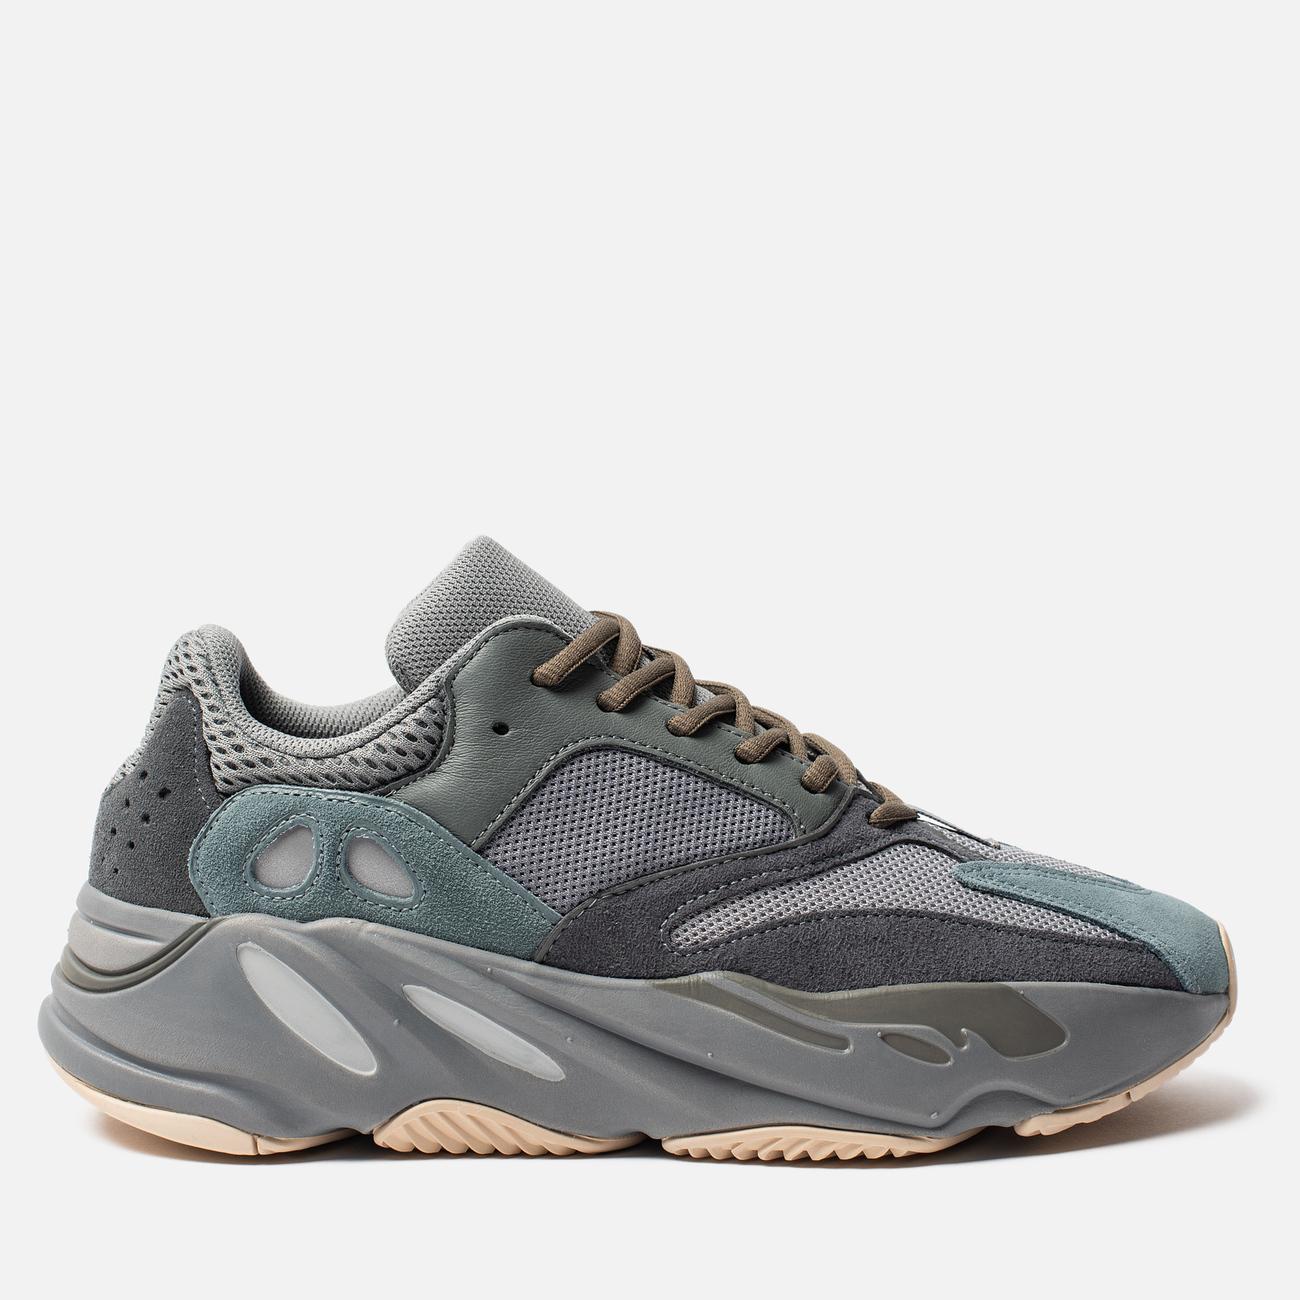 Кроссовки adidas Originals Yeezy Boost 700 Teal Blue/Teal Blue/Teal Blue